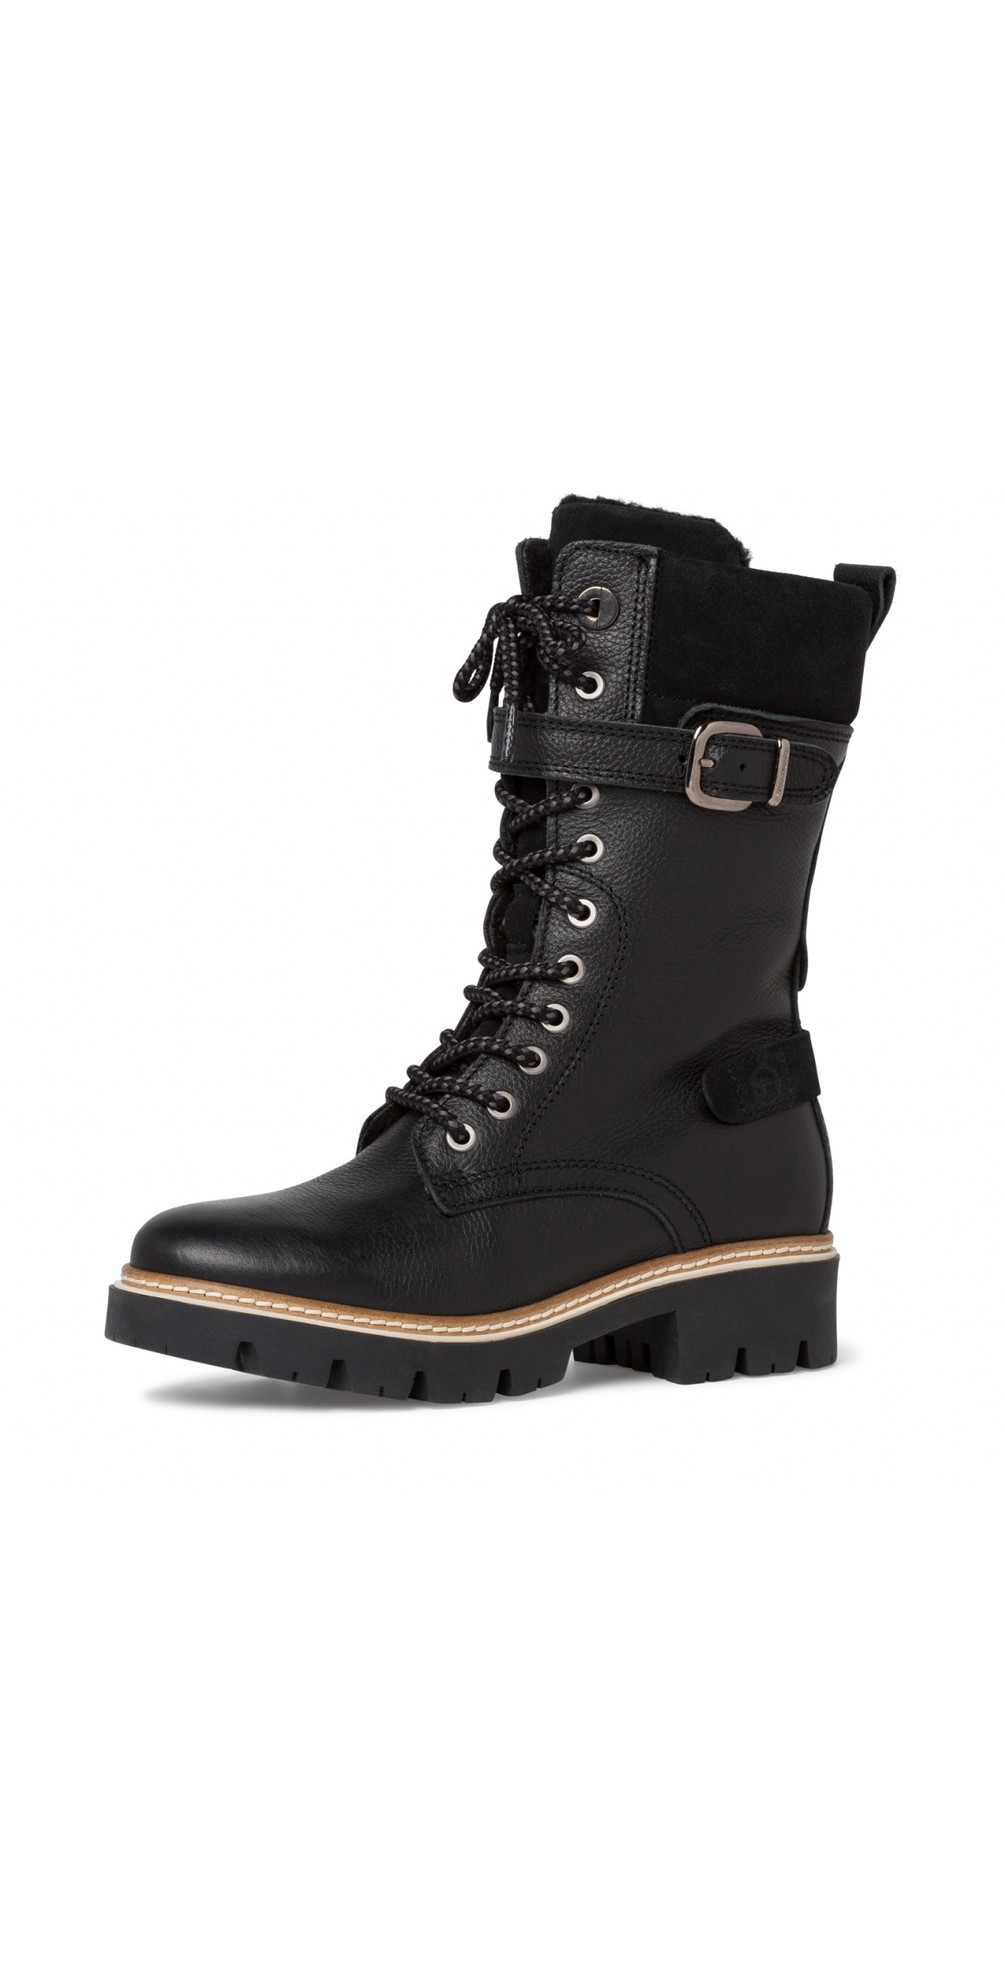 Caramello Duo Tex Tall Hiker Boot main image